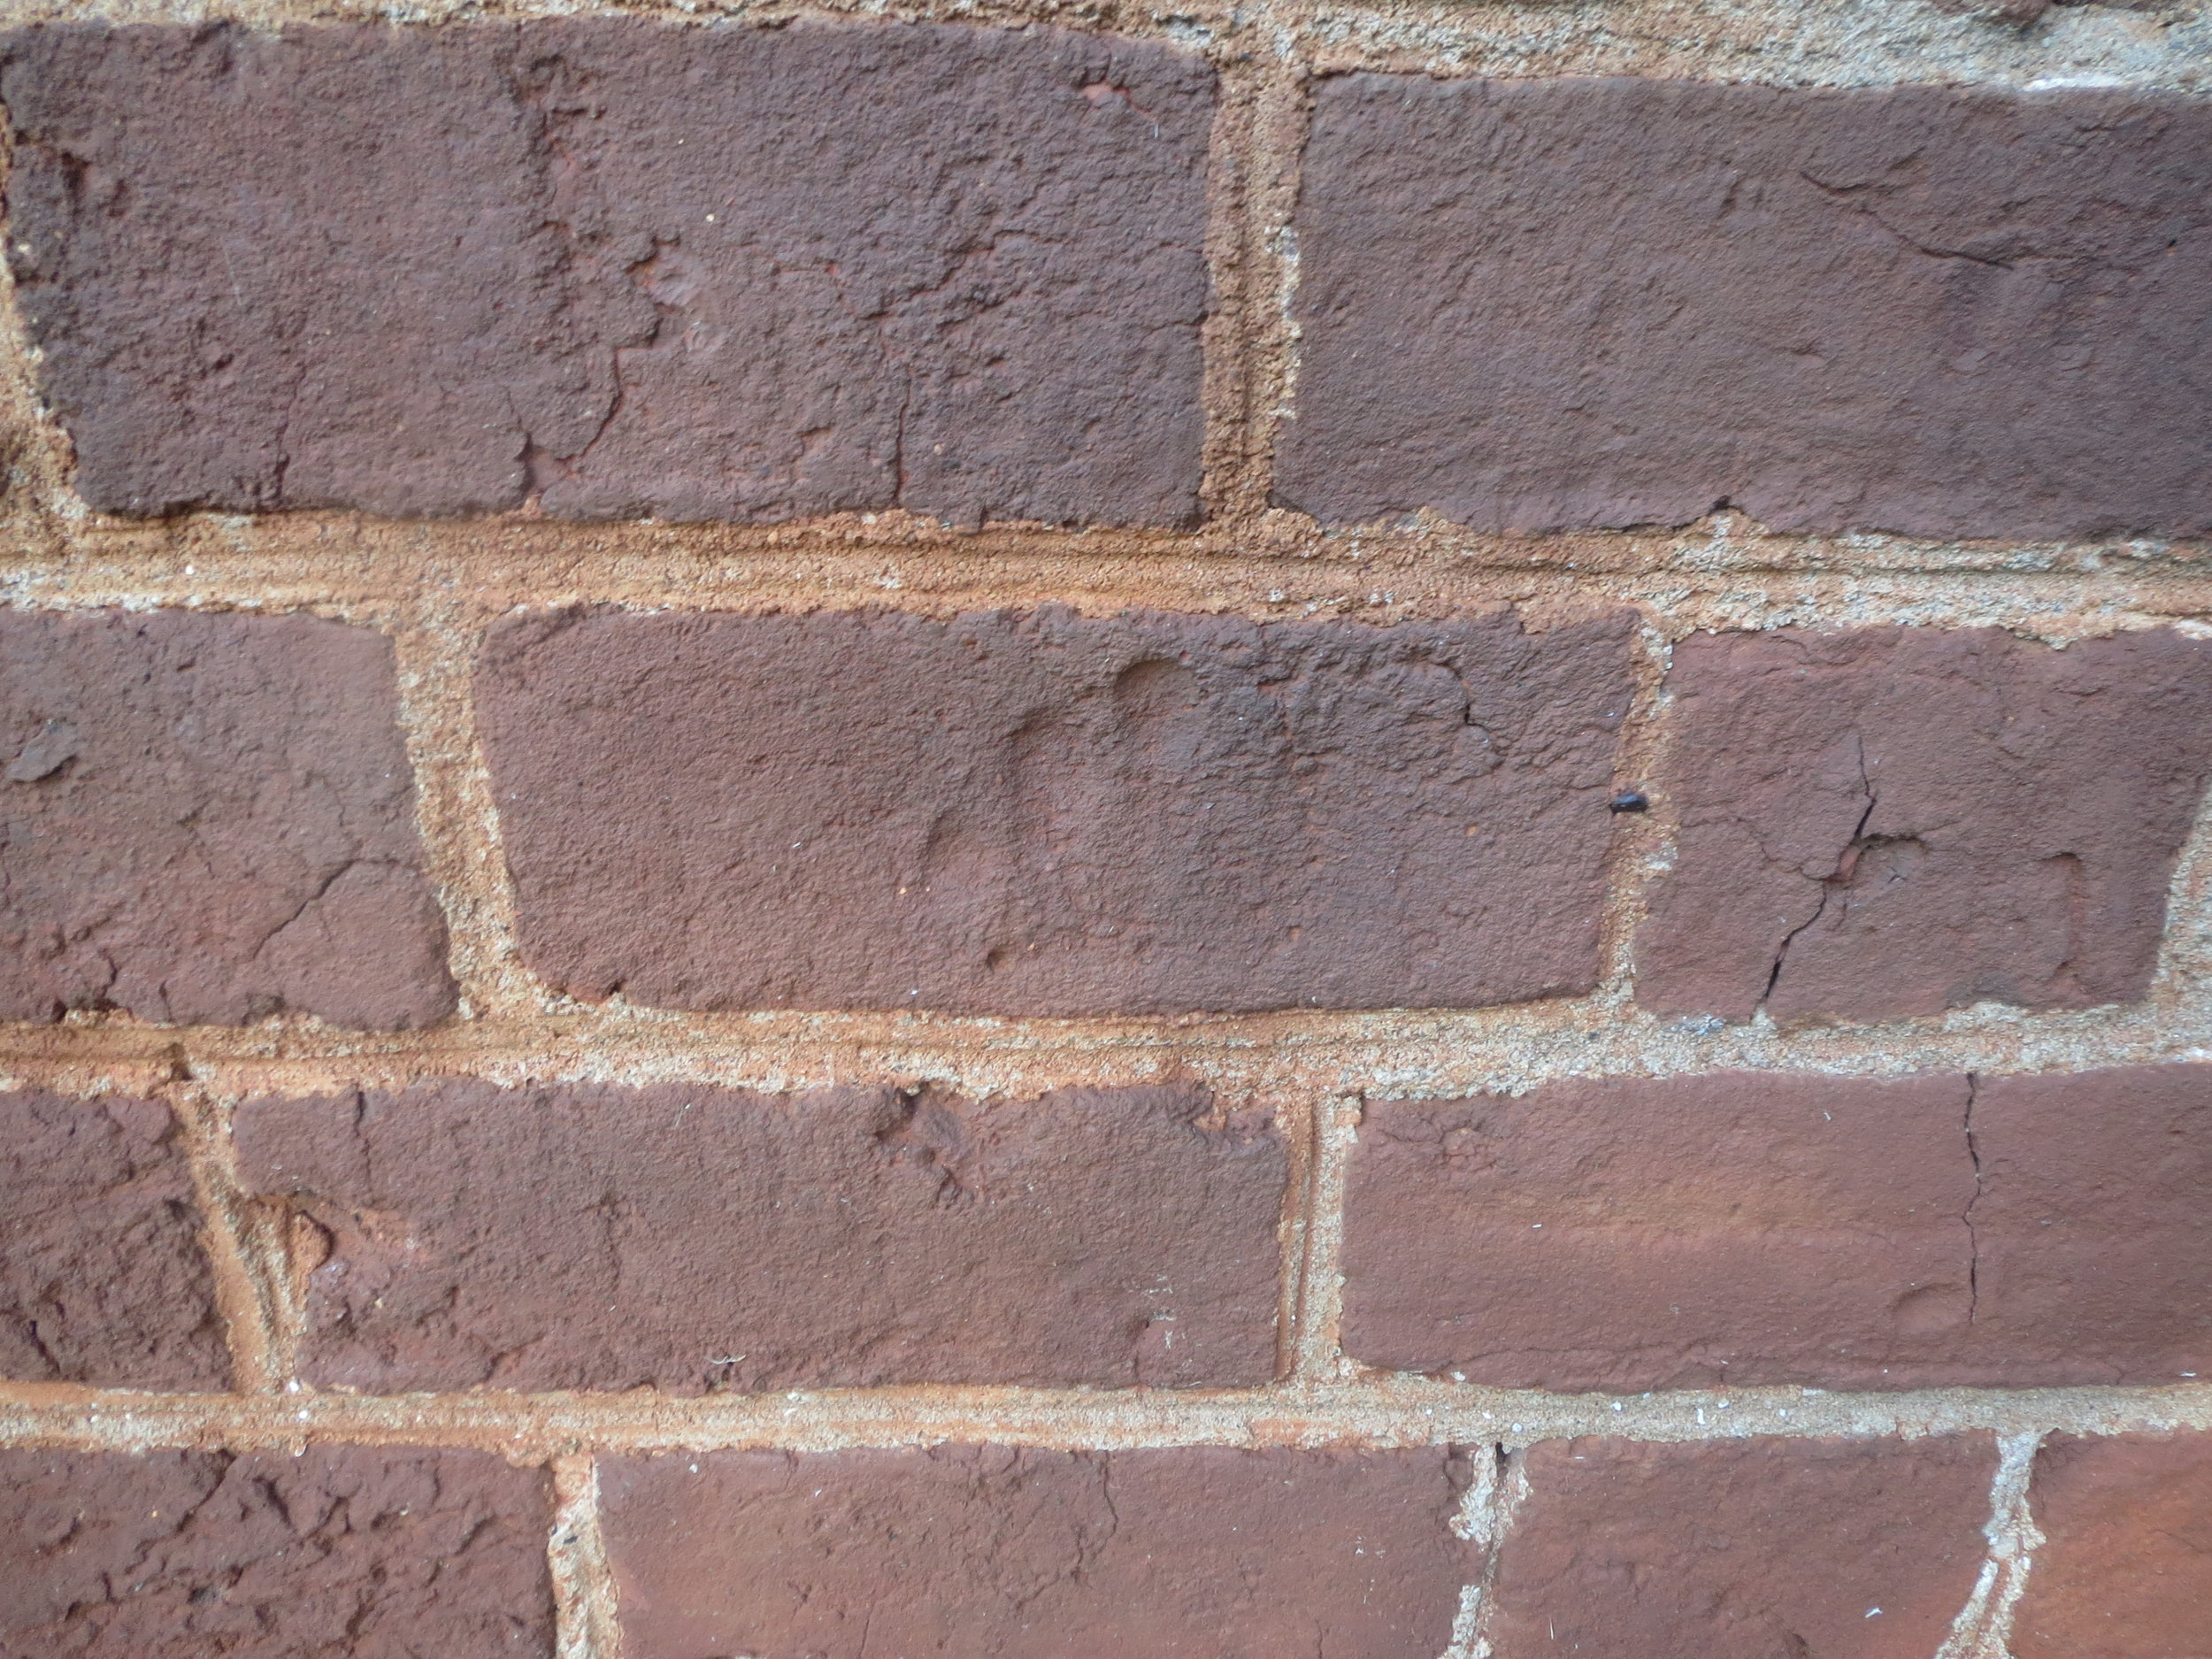 Child's Hand Print in Wet Brick